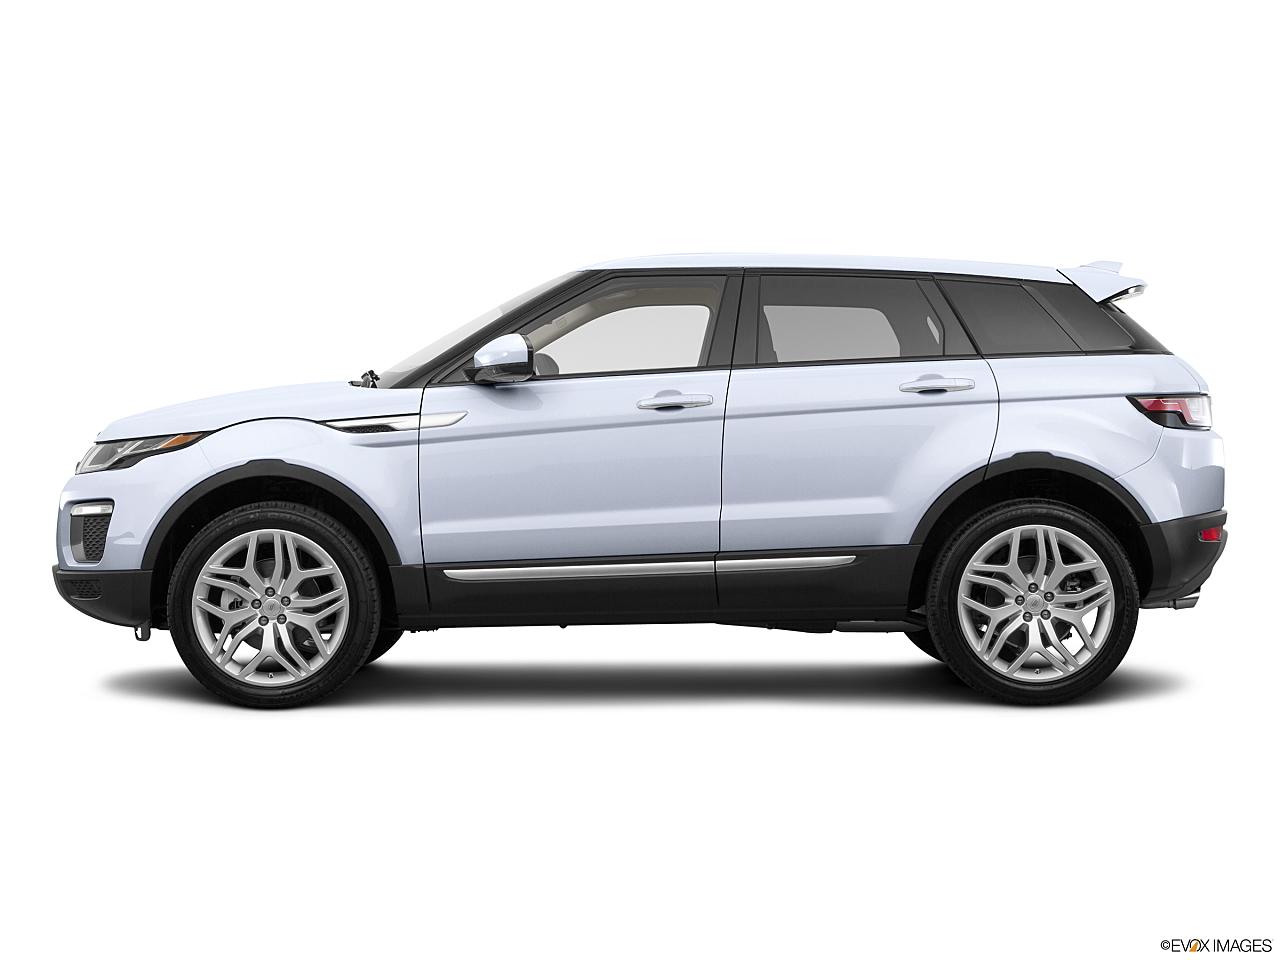 Land Rover El Paso >> 2016 Land Rover Range Rover Evoque HSE at Jaguar Land